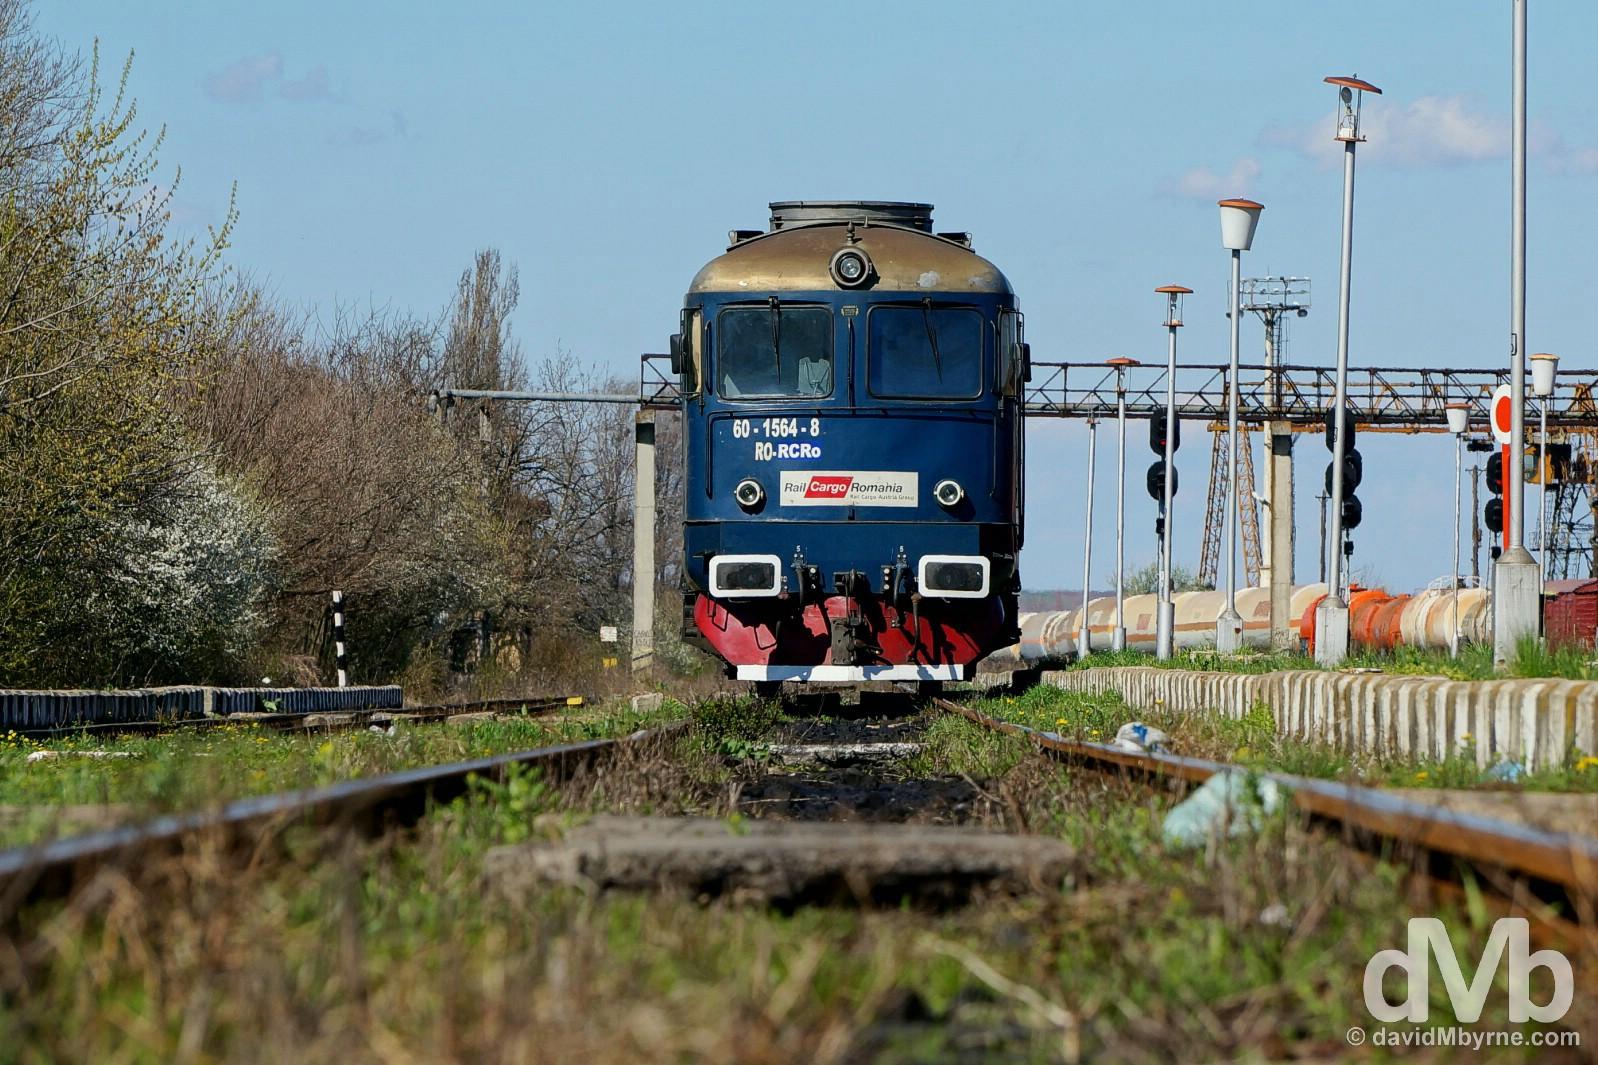 Riding the Balkan rails. Veliko Tarnovo, Bulgaria, to Bucharest, Romania. March 31, 2015.